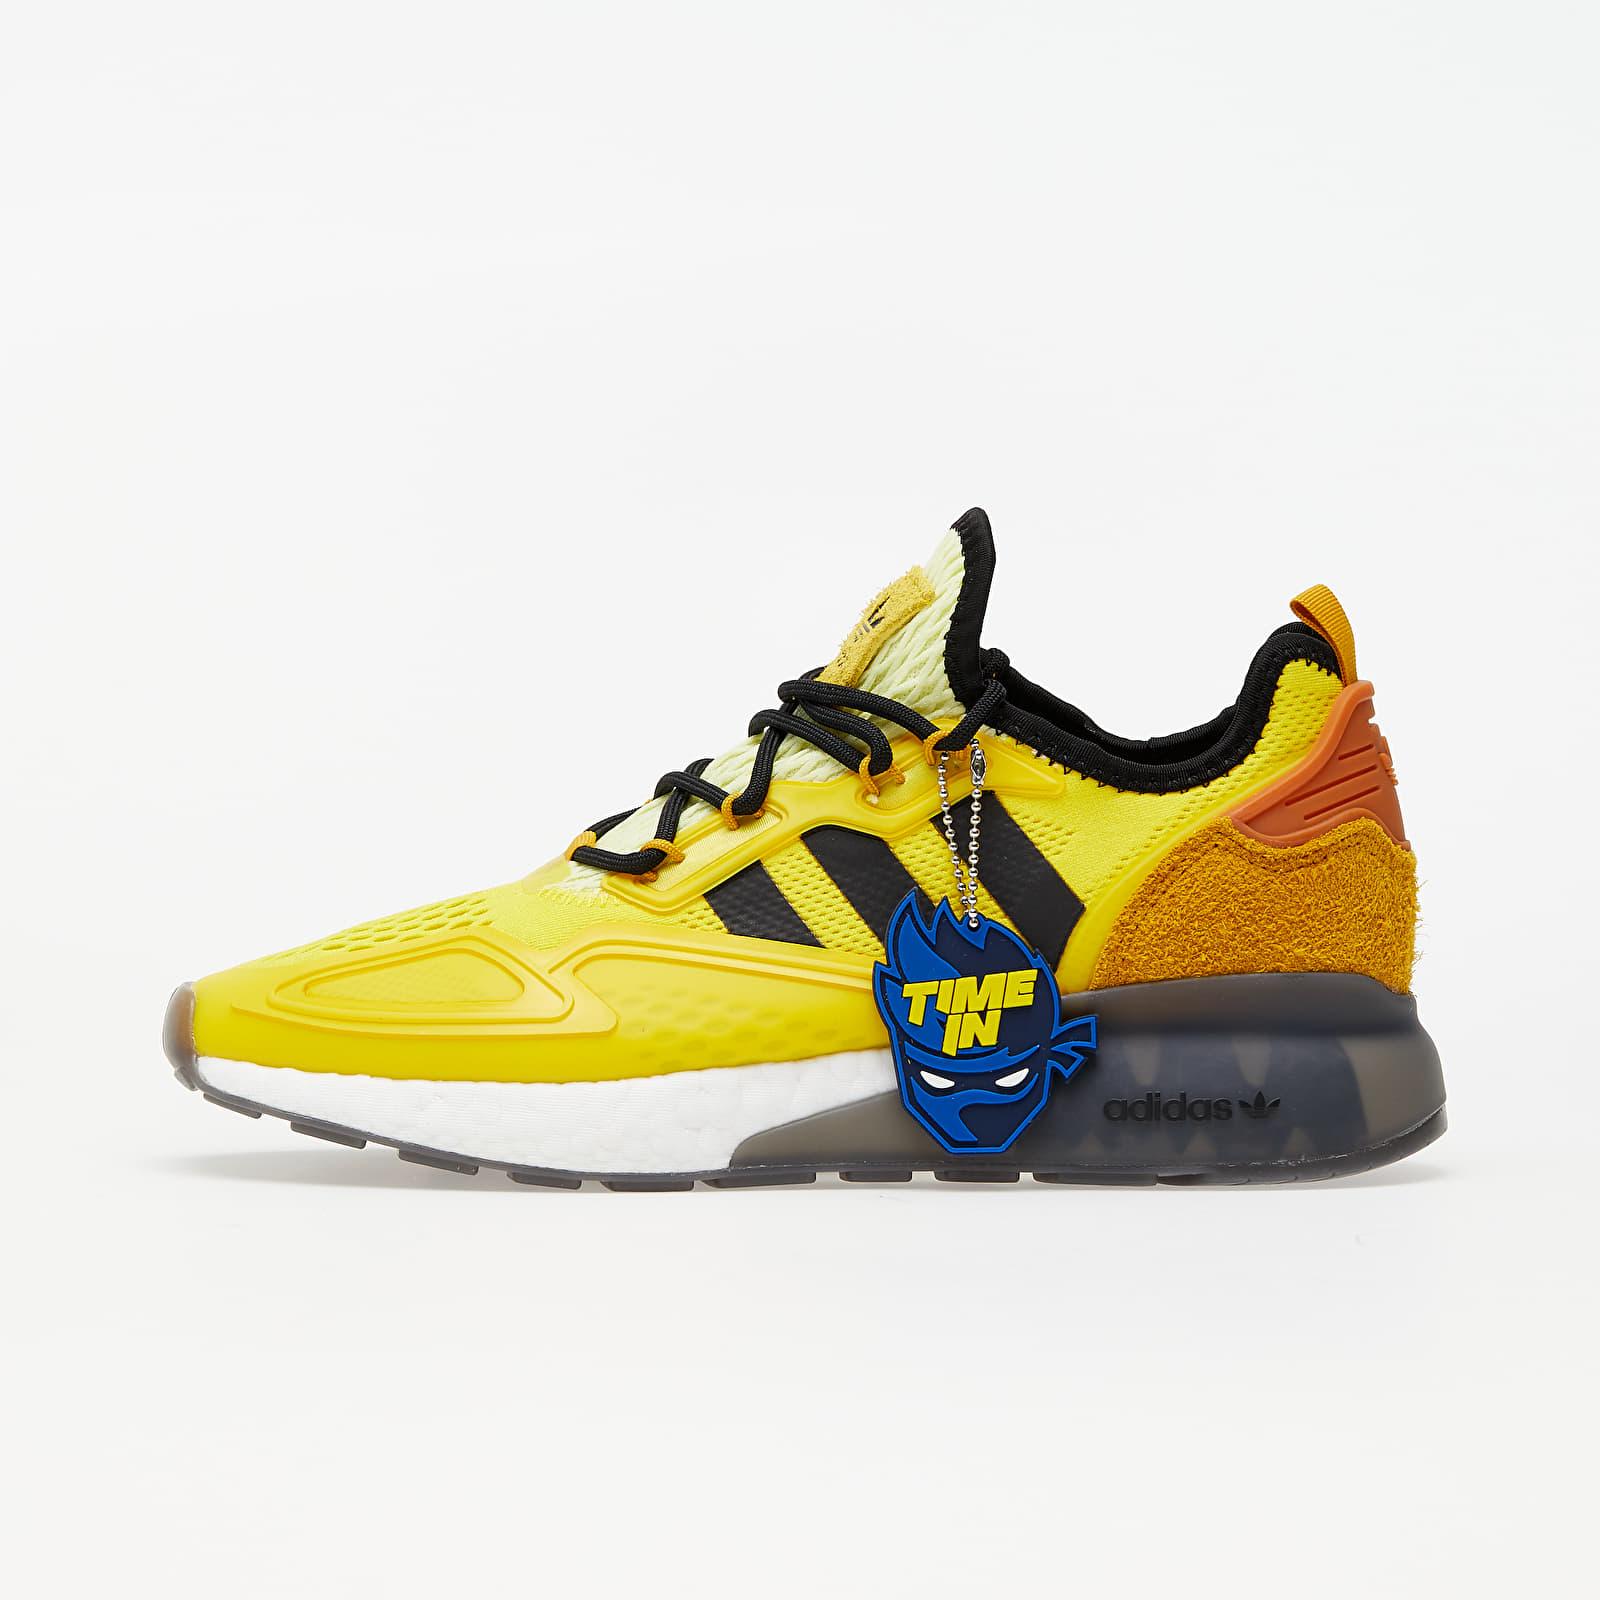 adidas x Ninja ZX 2K Boost Yellow/ Legend Gold/ Tech Copper   Footshop